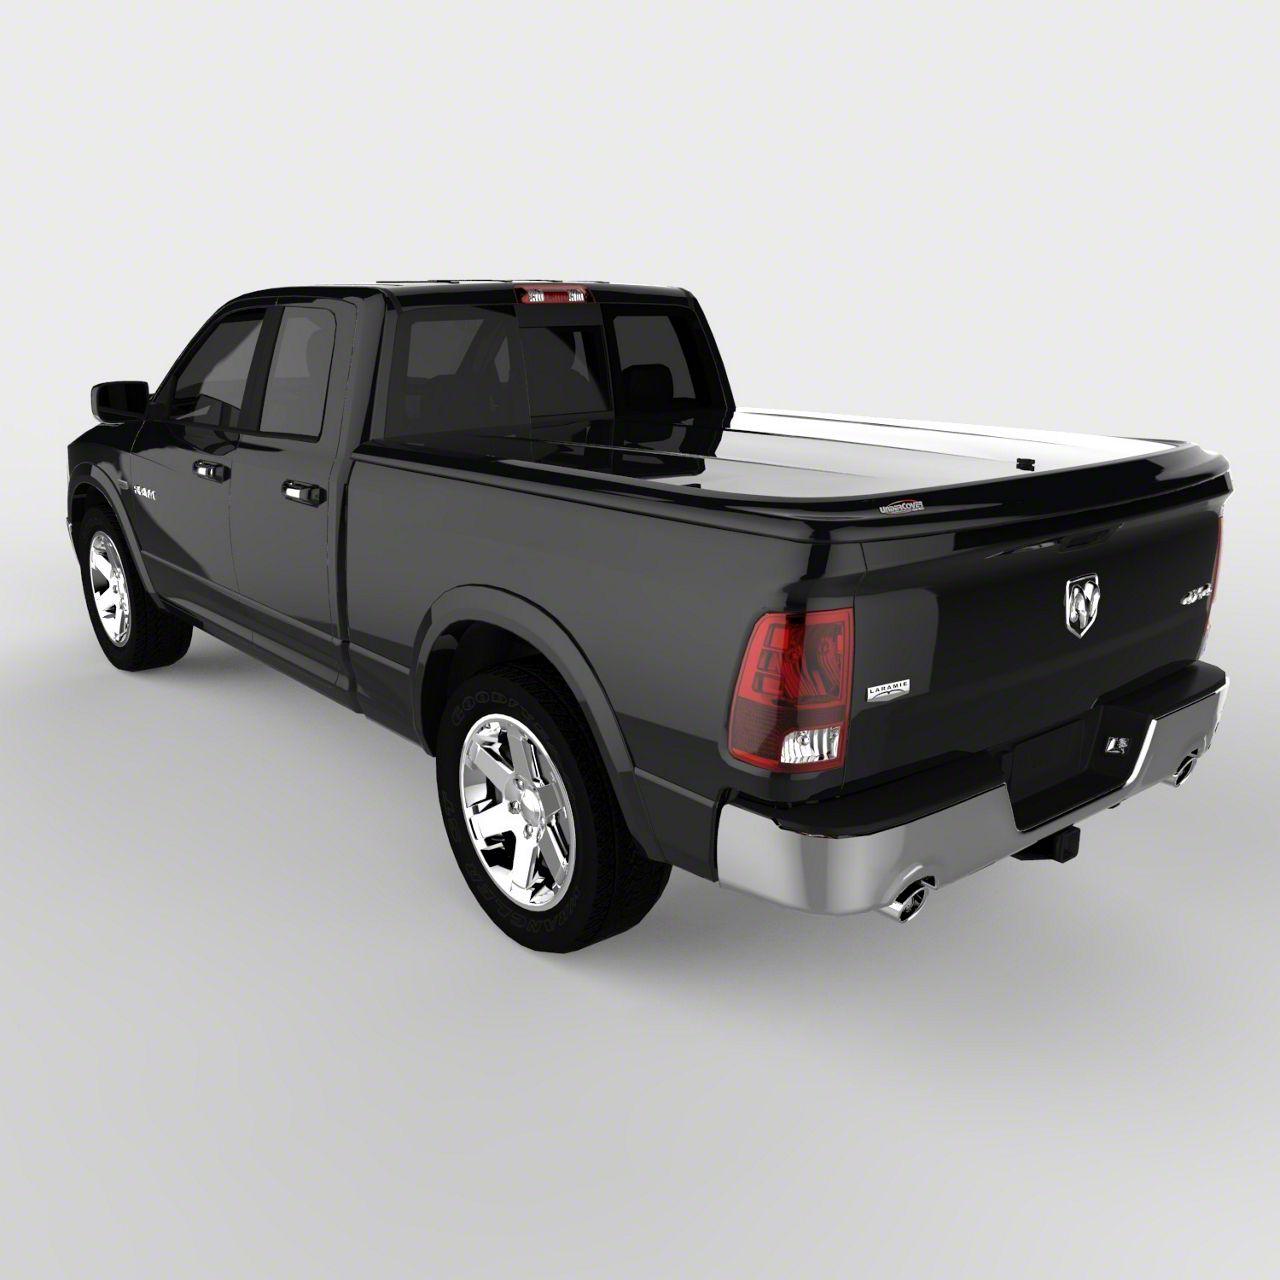 UnderCover SE Hinged Tonneau Cover - Black Textured (09-18 RAM 1500 w/ 5.7 ft. & 6.4 ft. Box & w/o RAM Box)